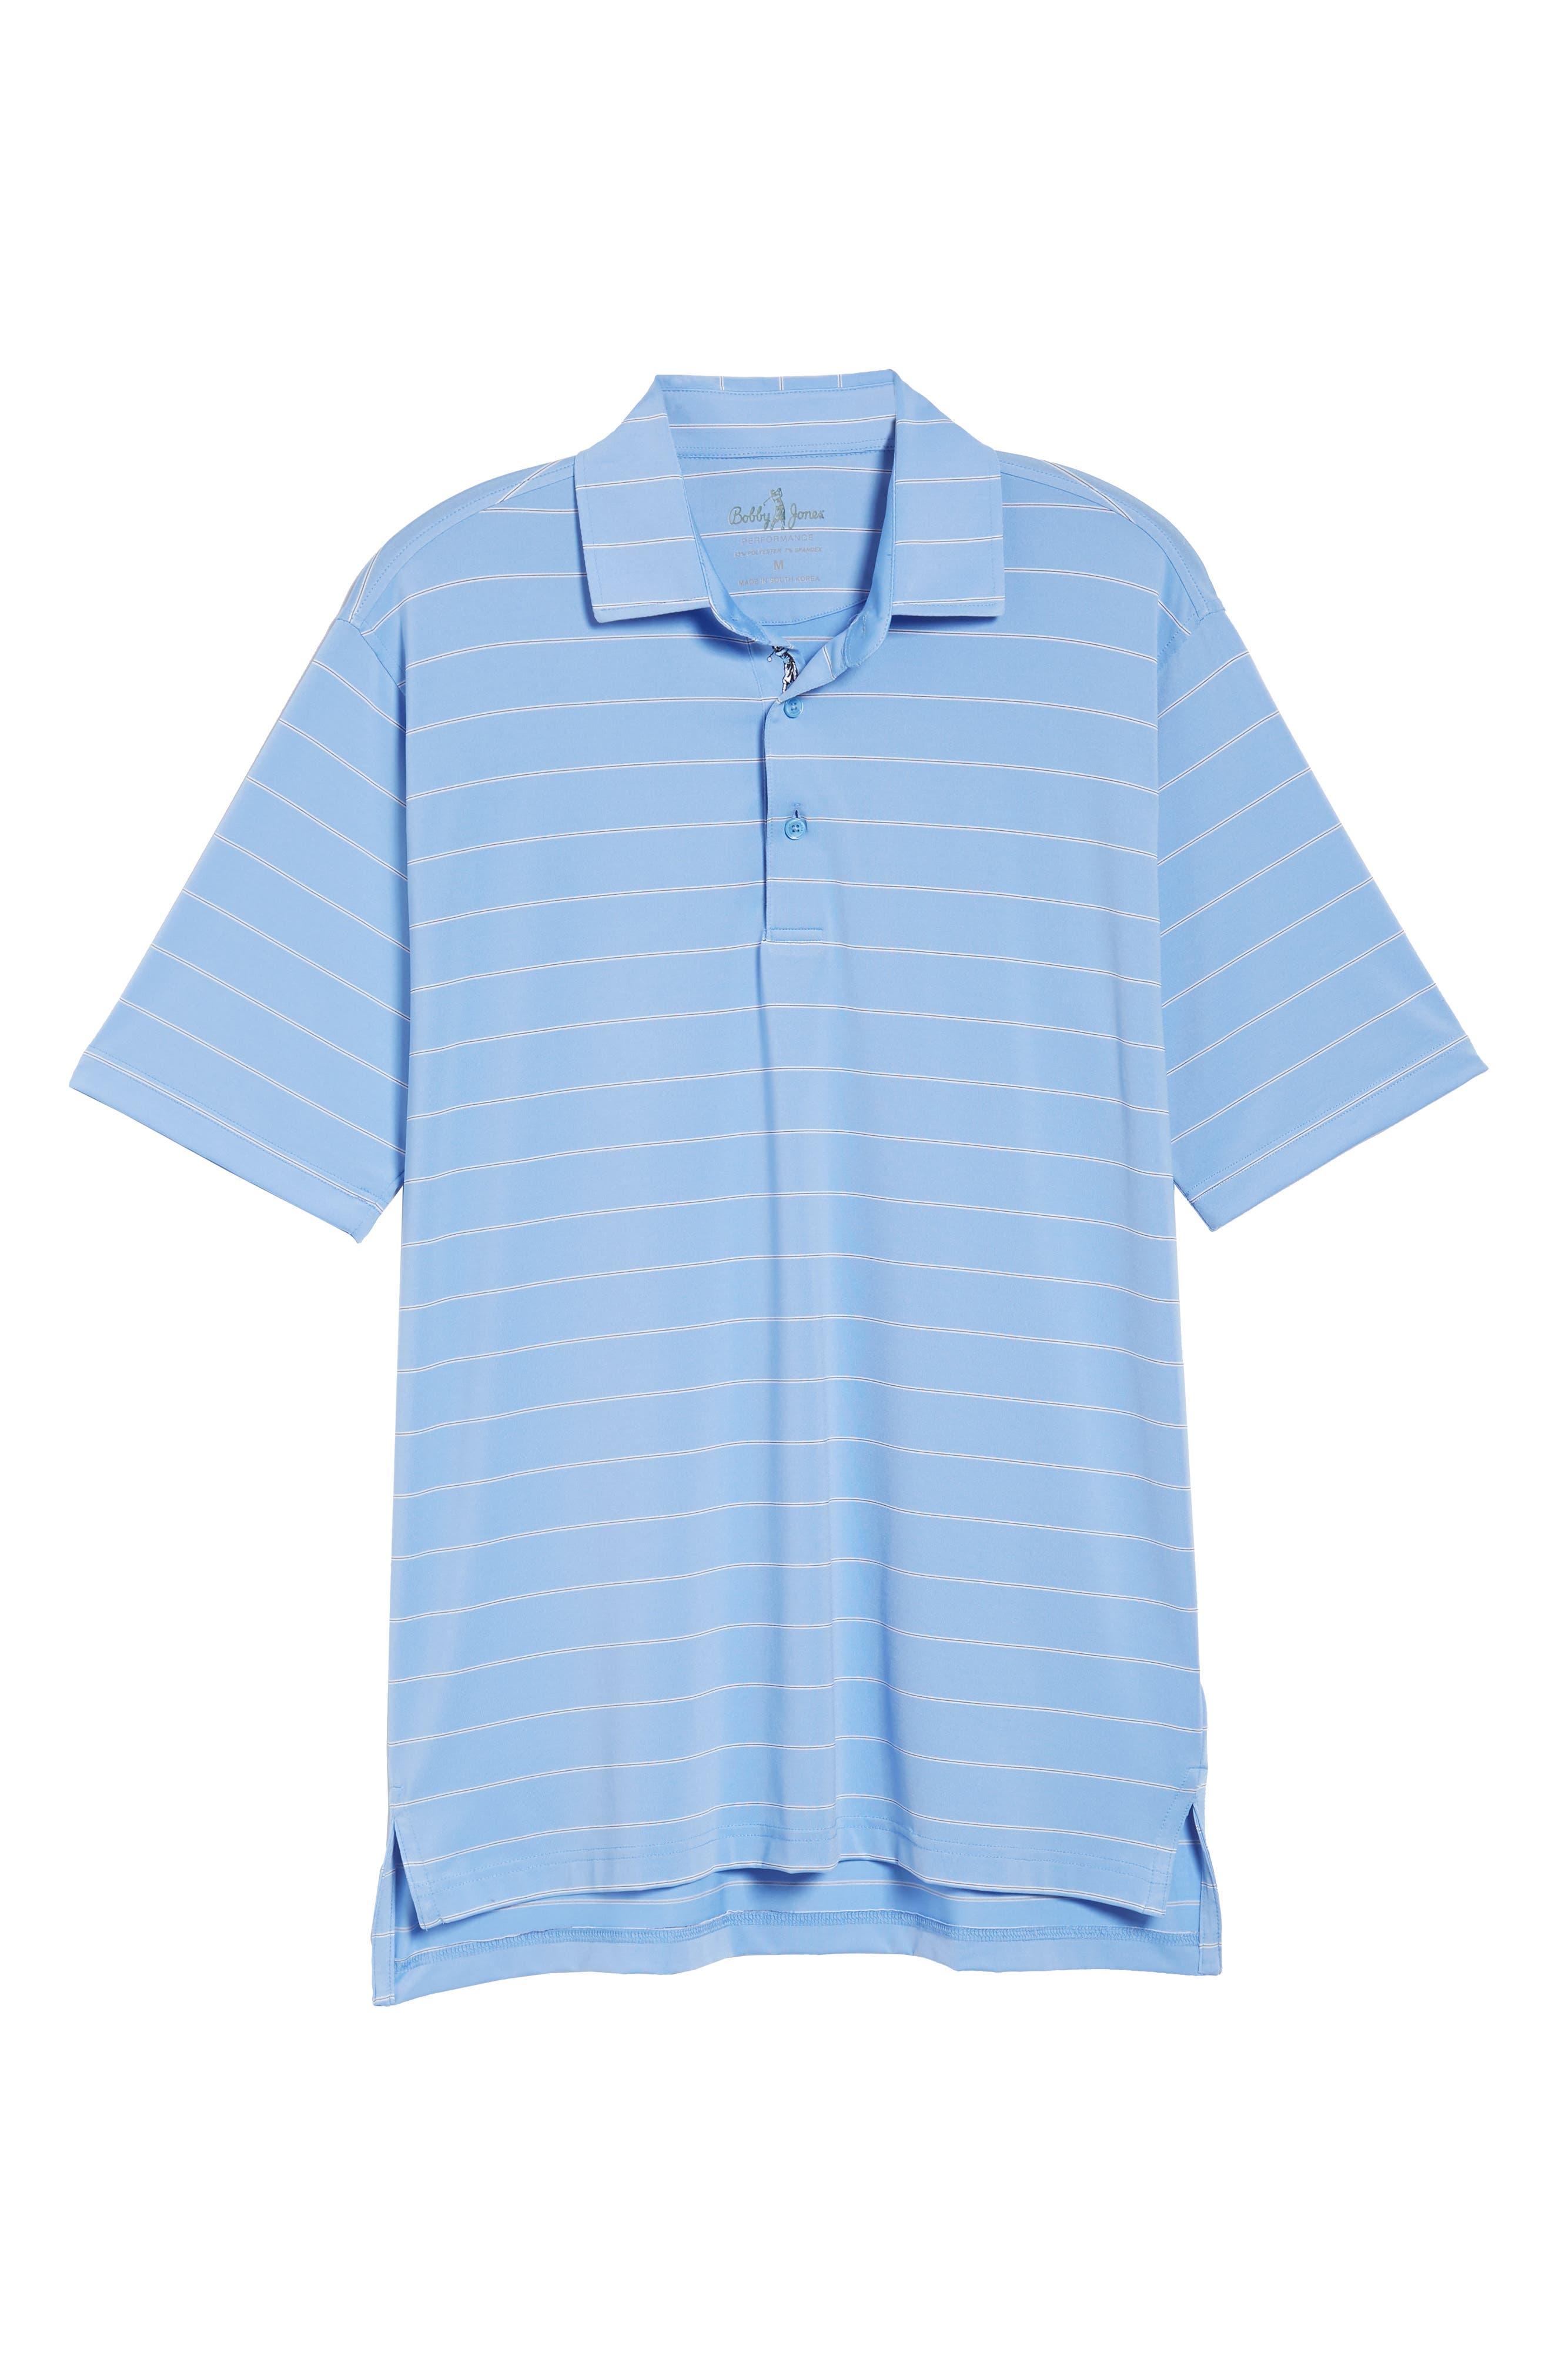 XH2O Momentum Stripe Jersey Polo,                             Alternate thumbnail 6, color,                             459